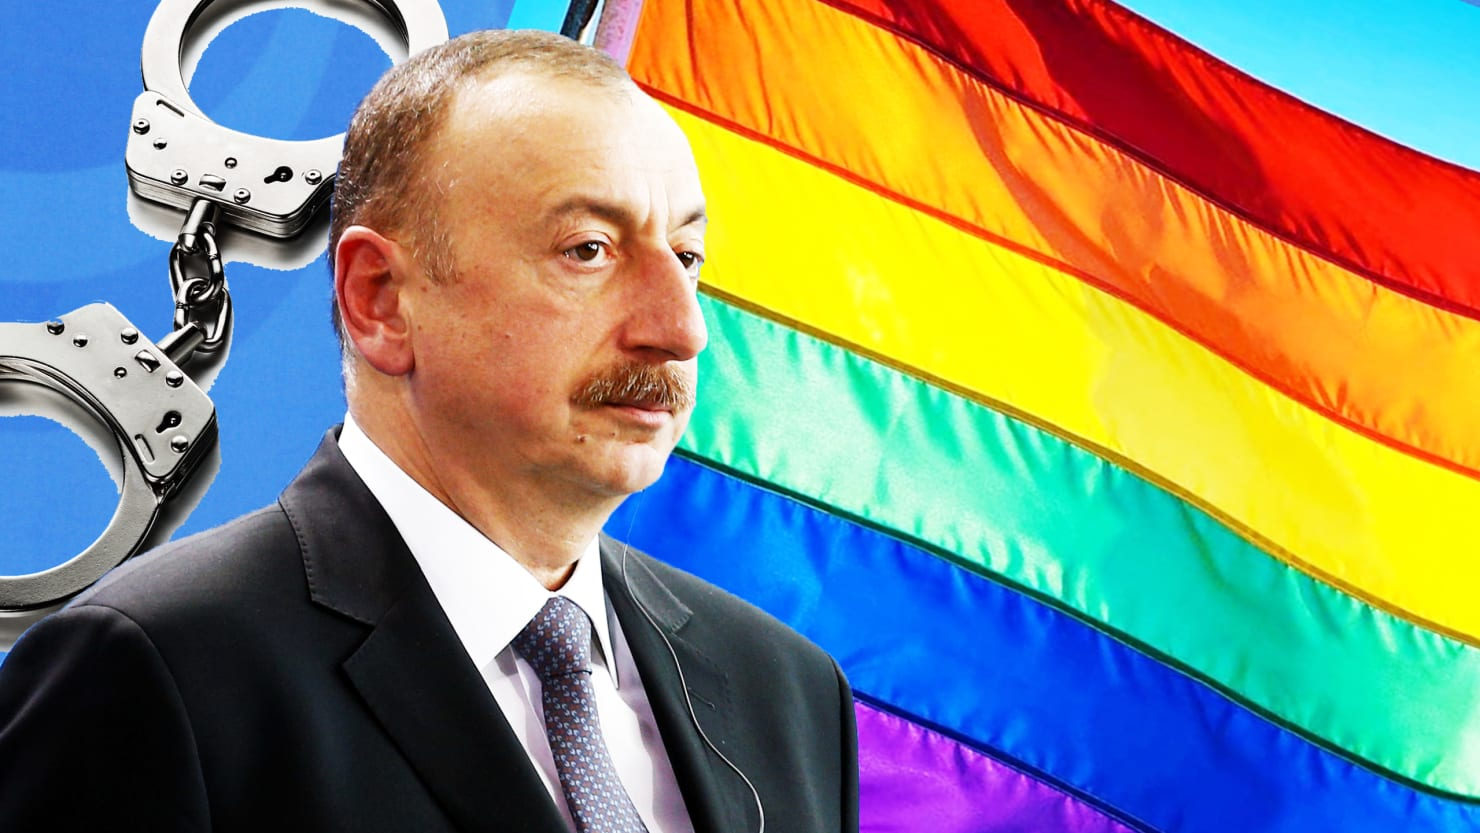 Inside the Frightening LGBTQ Crackdown in Azerbaijan